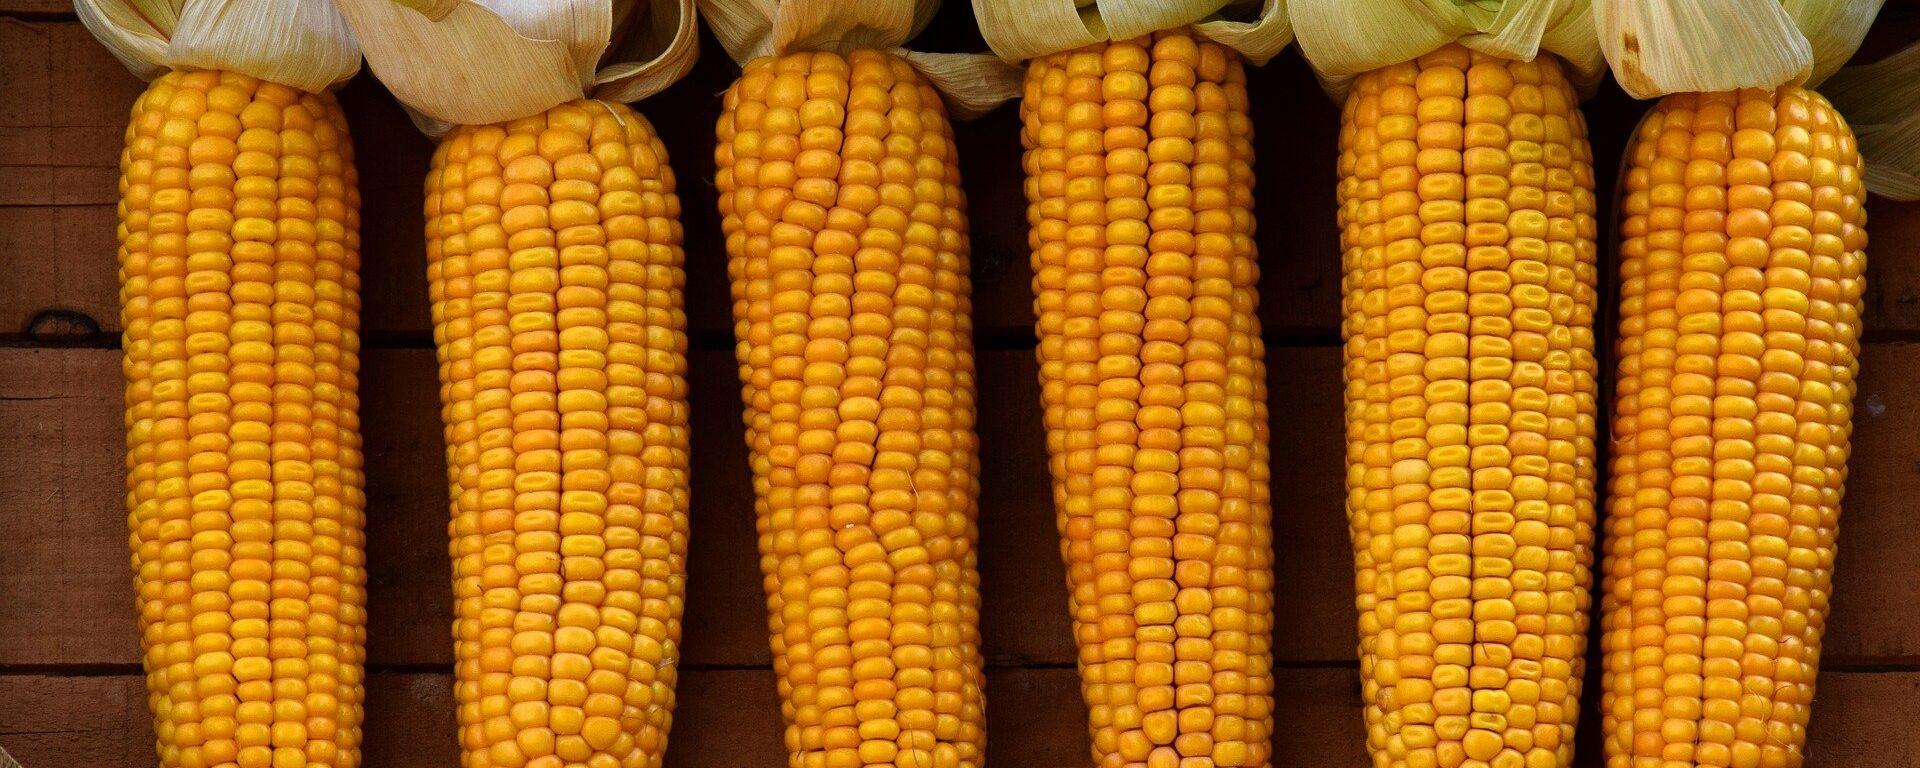 Mazorcas de maíz  - Sputnik Mundo, 1920, 10.11.2020